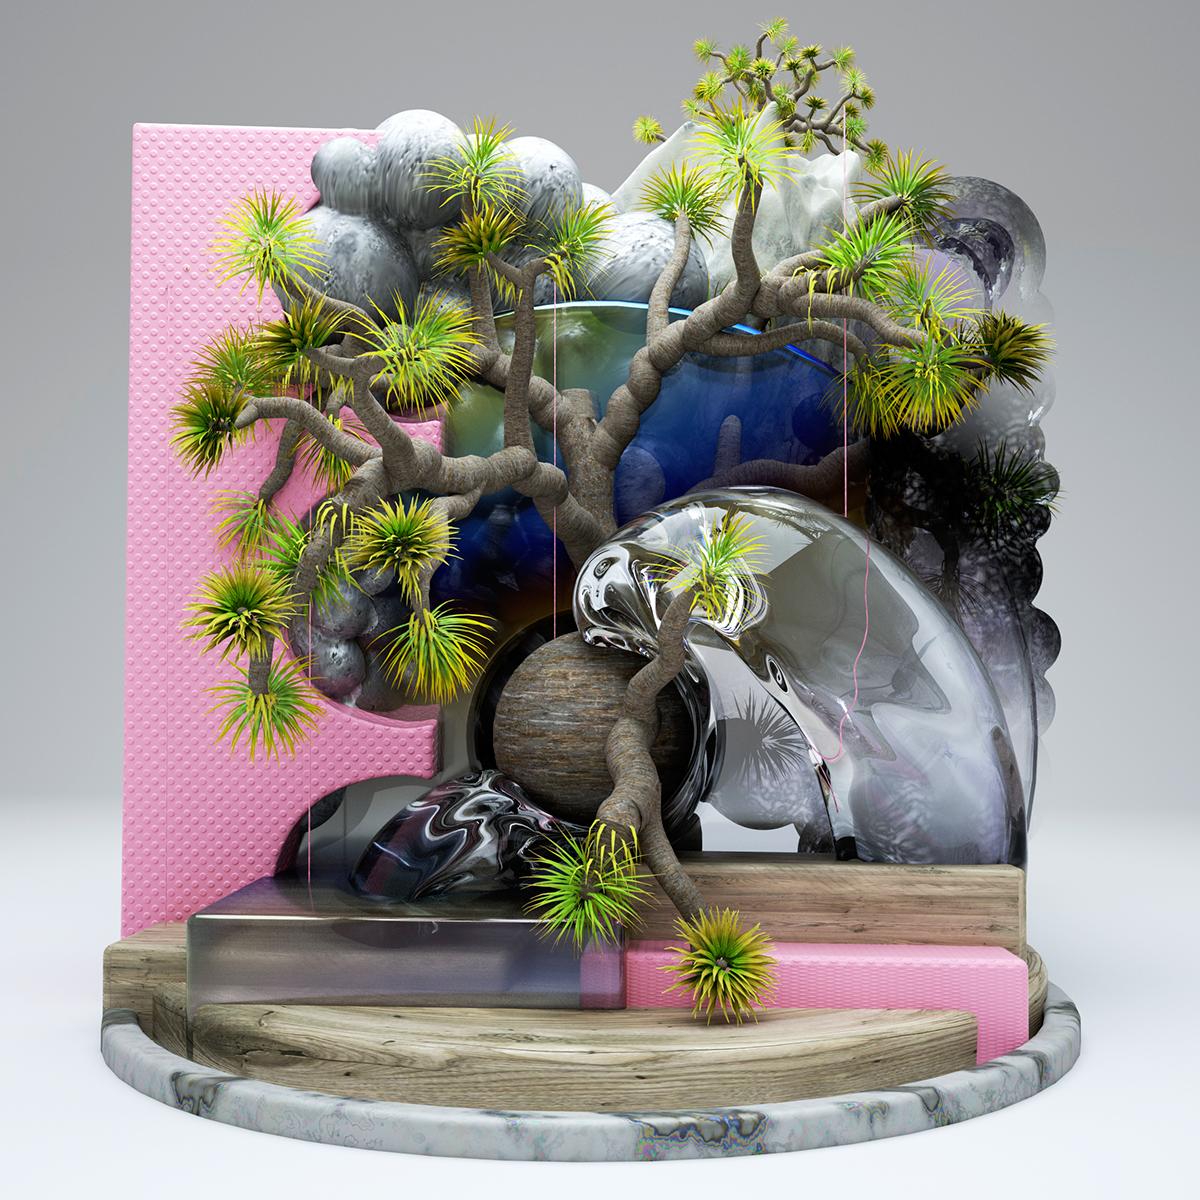 antoni tudisco surreal worlds 2.0 3D adobe design